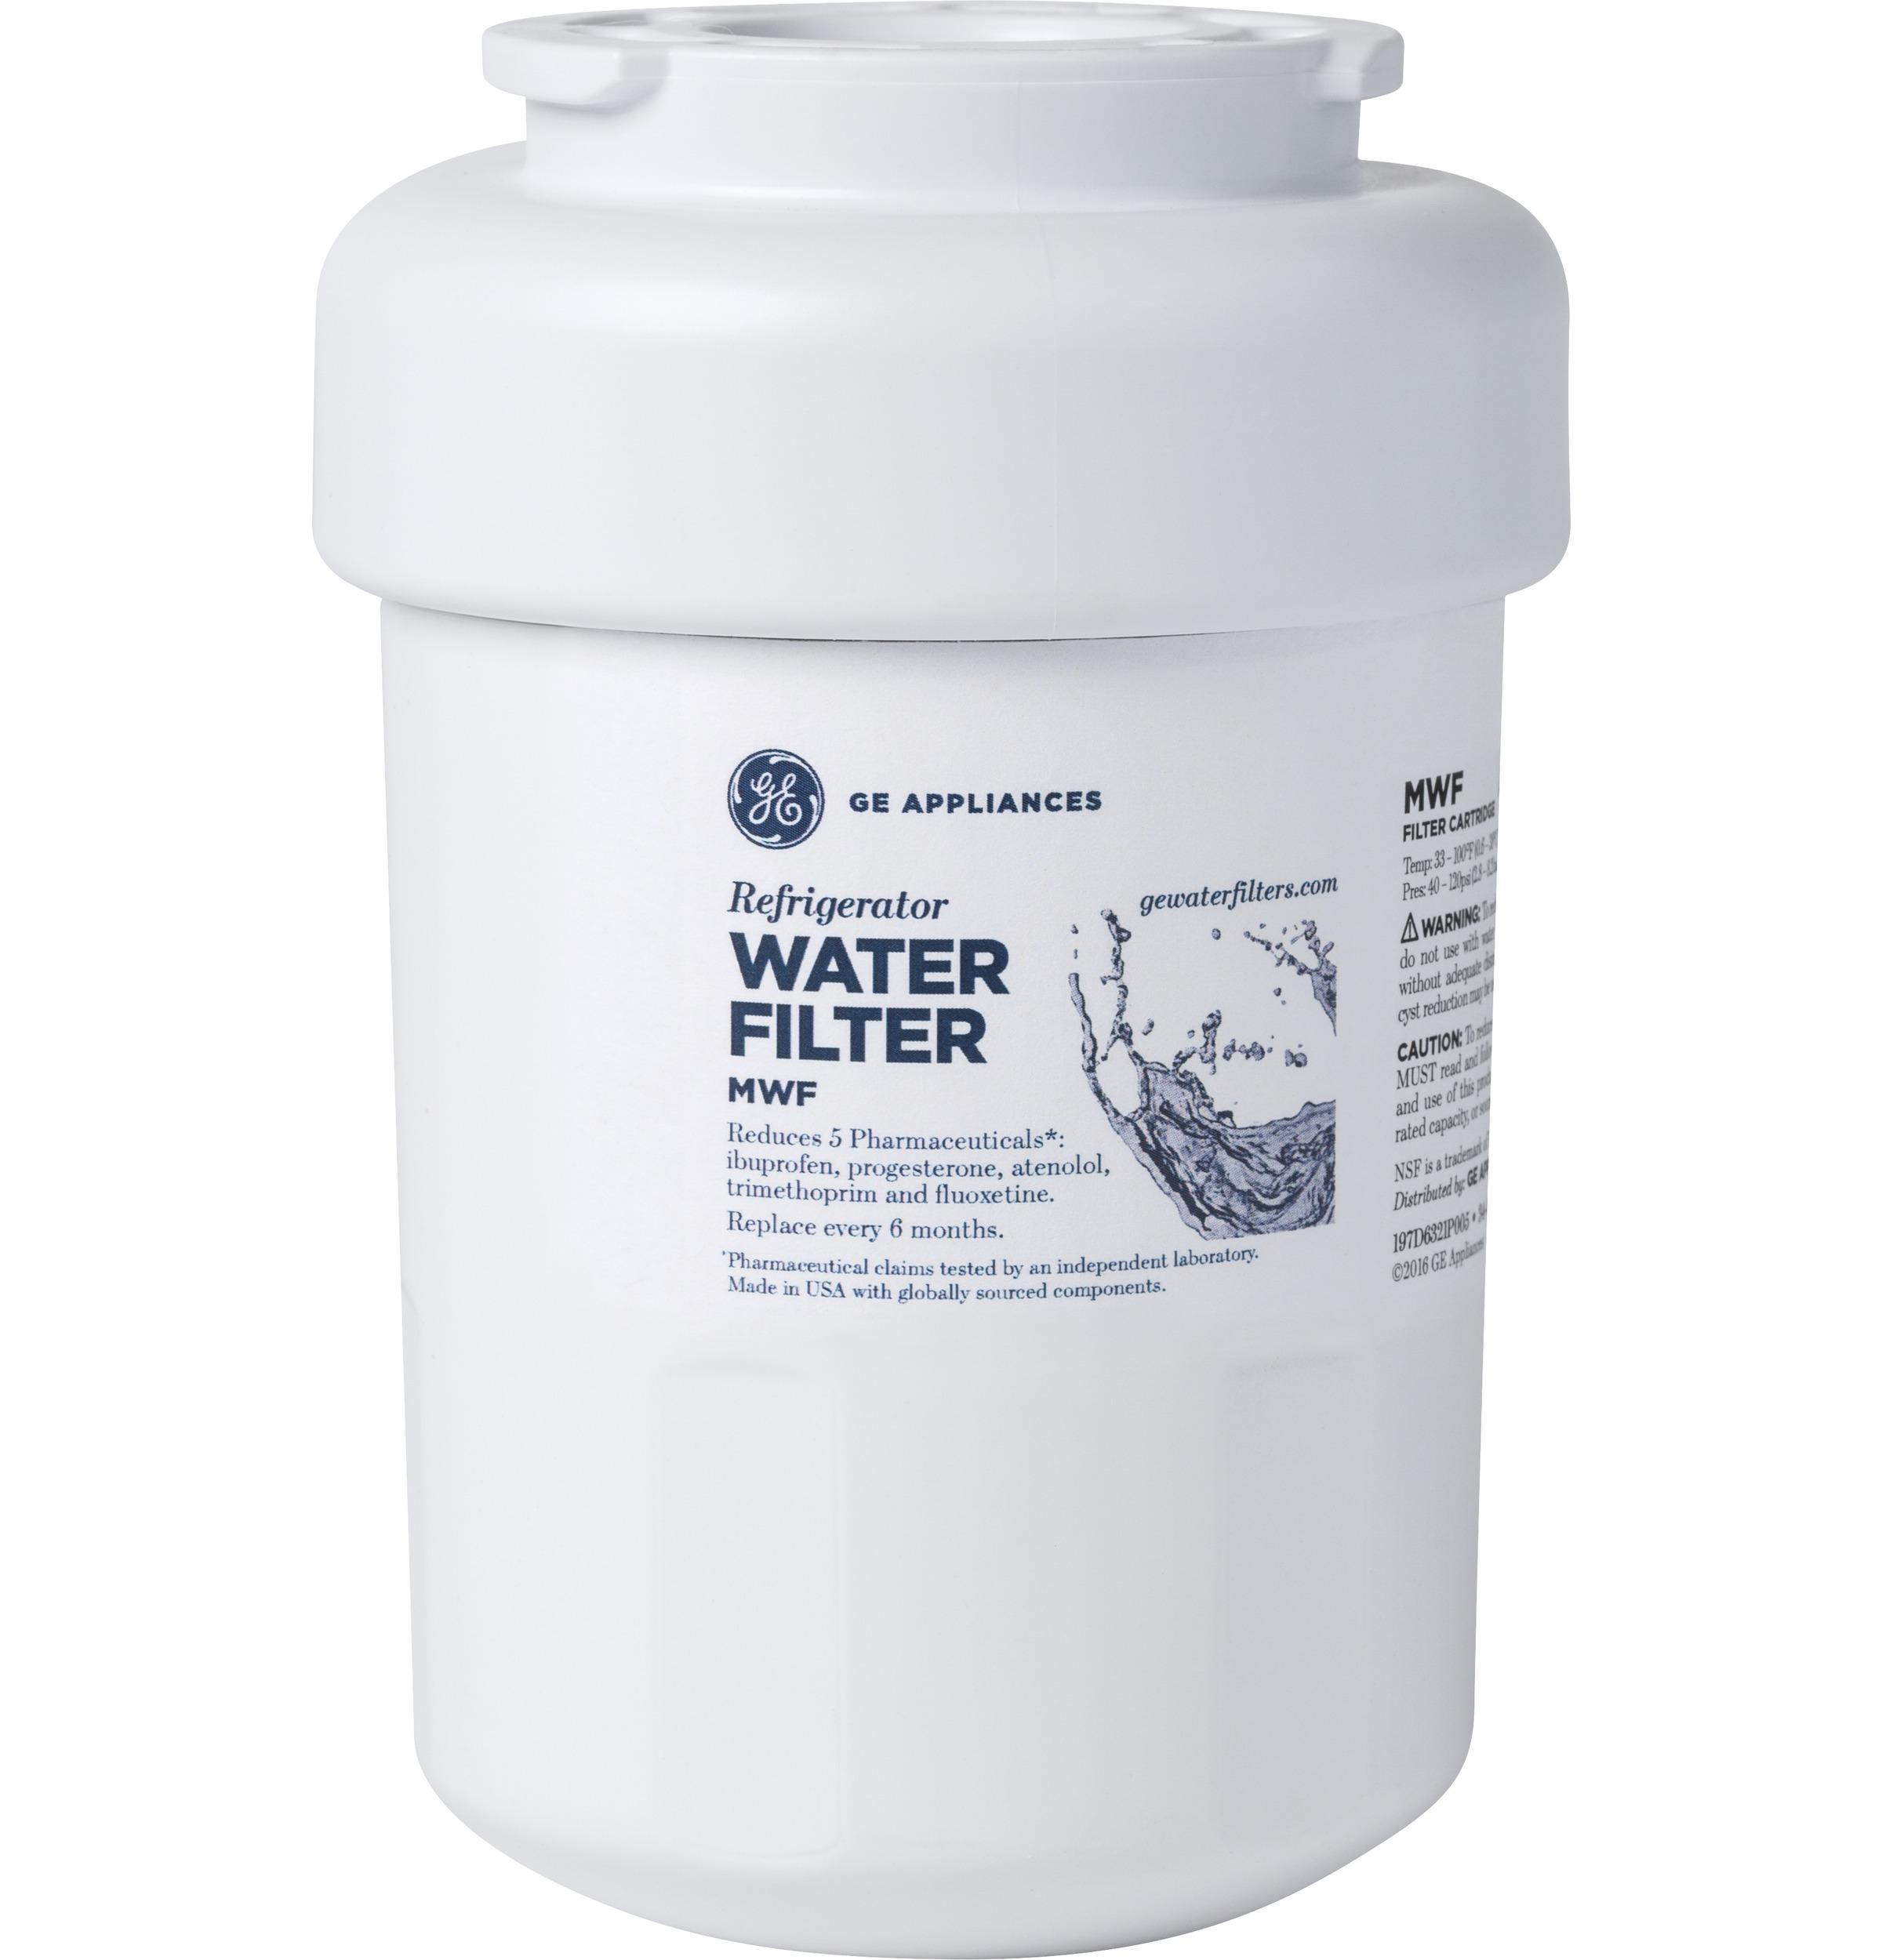 GE MWF Replacement Refrigerator Water Filter Cartridge #MWF $13